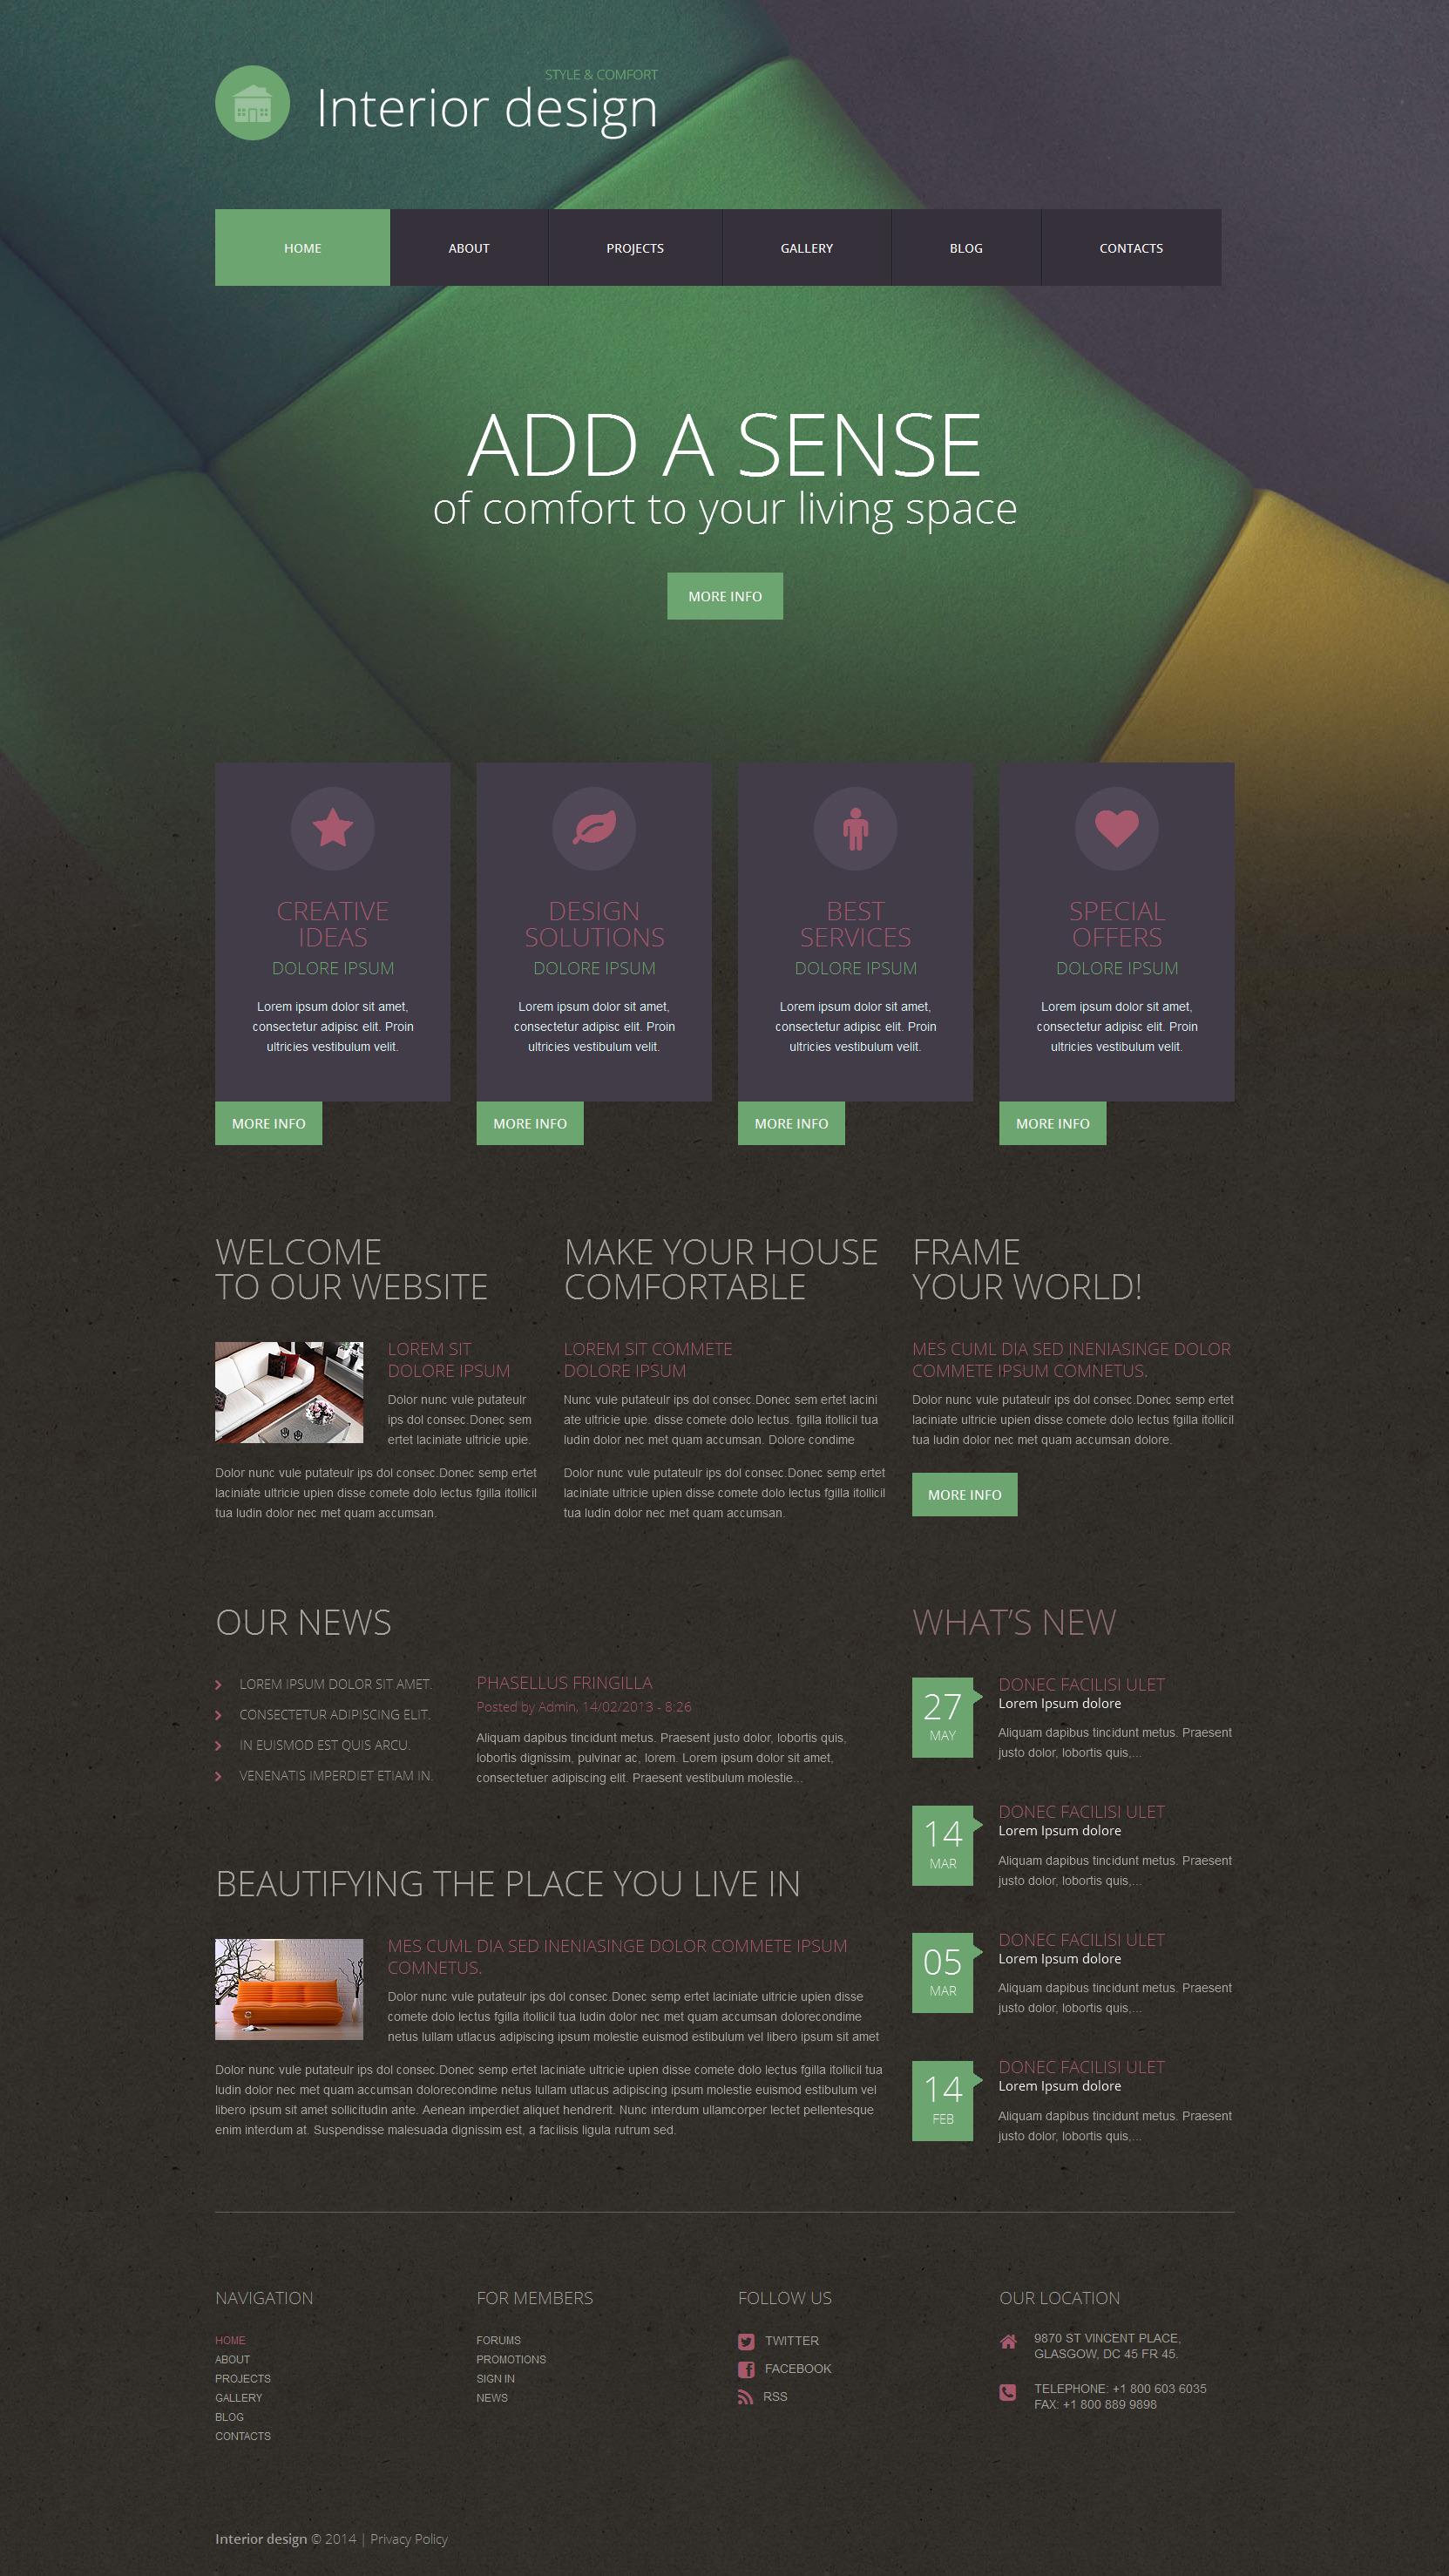 Responzivní WordPress motiv na téma Design interiéru #52064 - screenshot